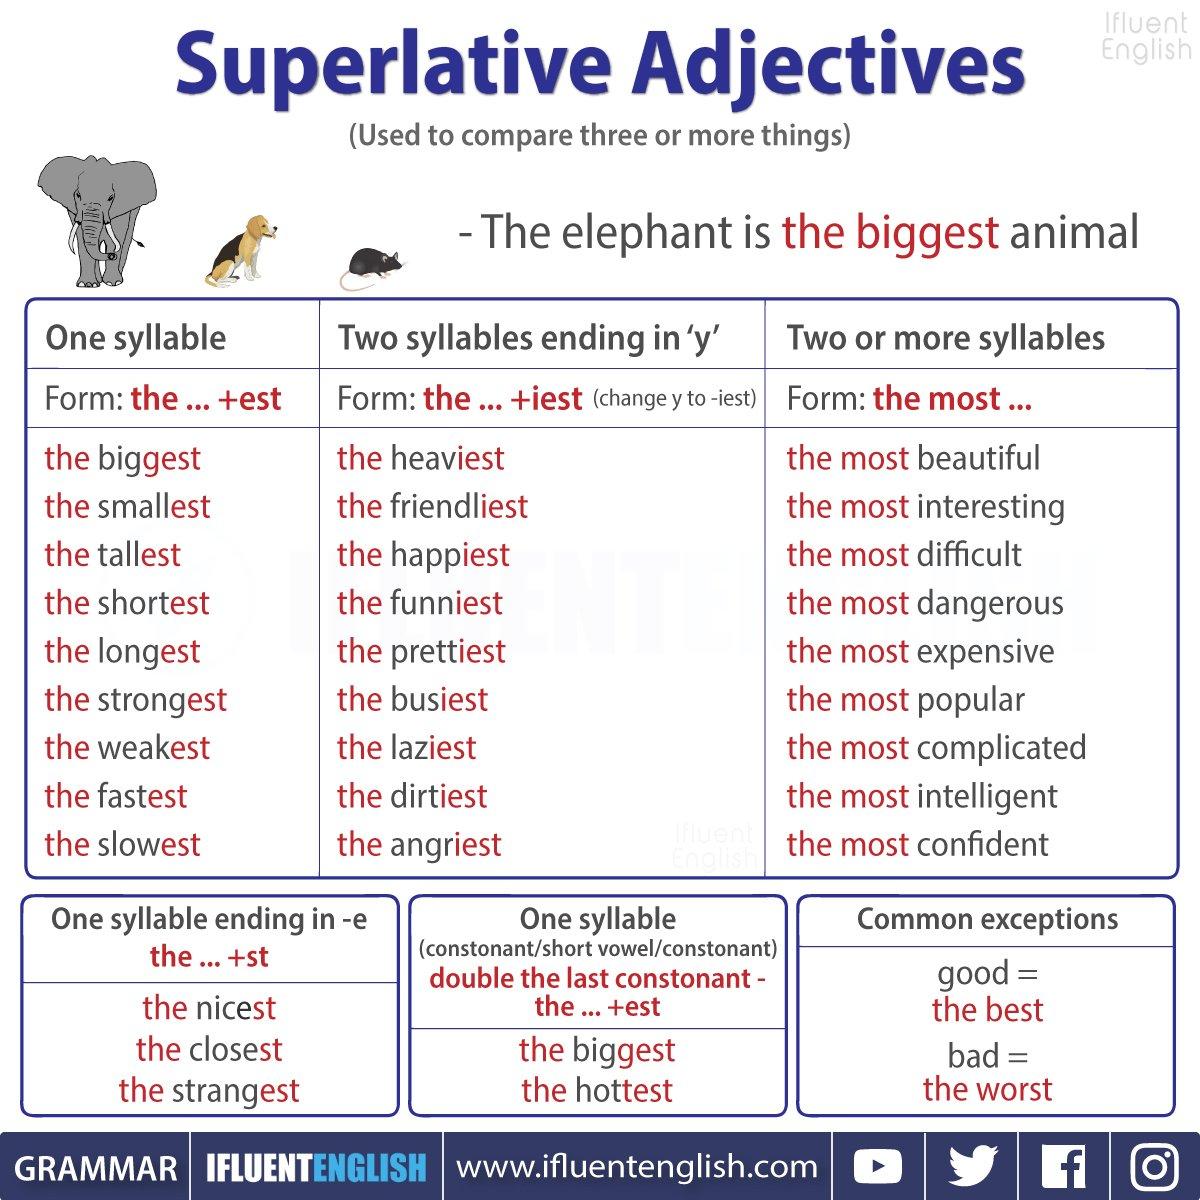 Benjamin J Evans On Twitter Superlative Adjectives